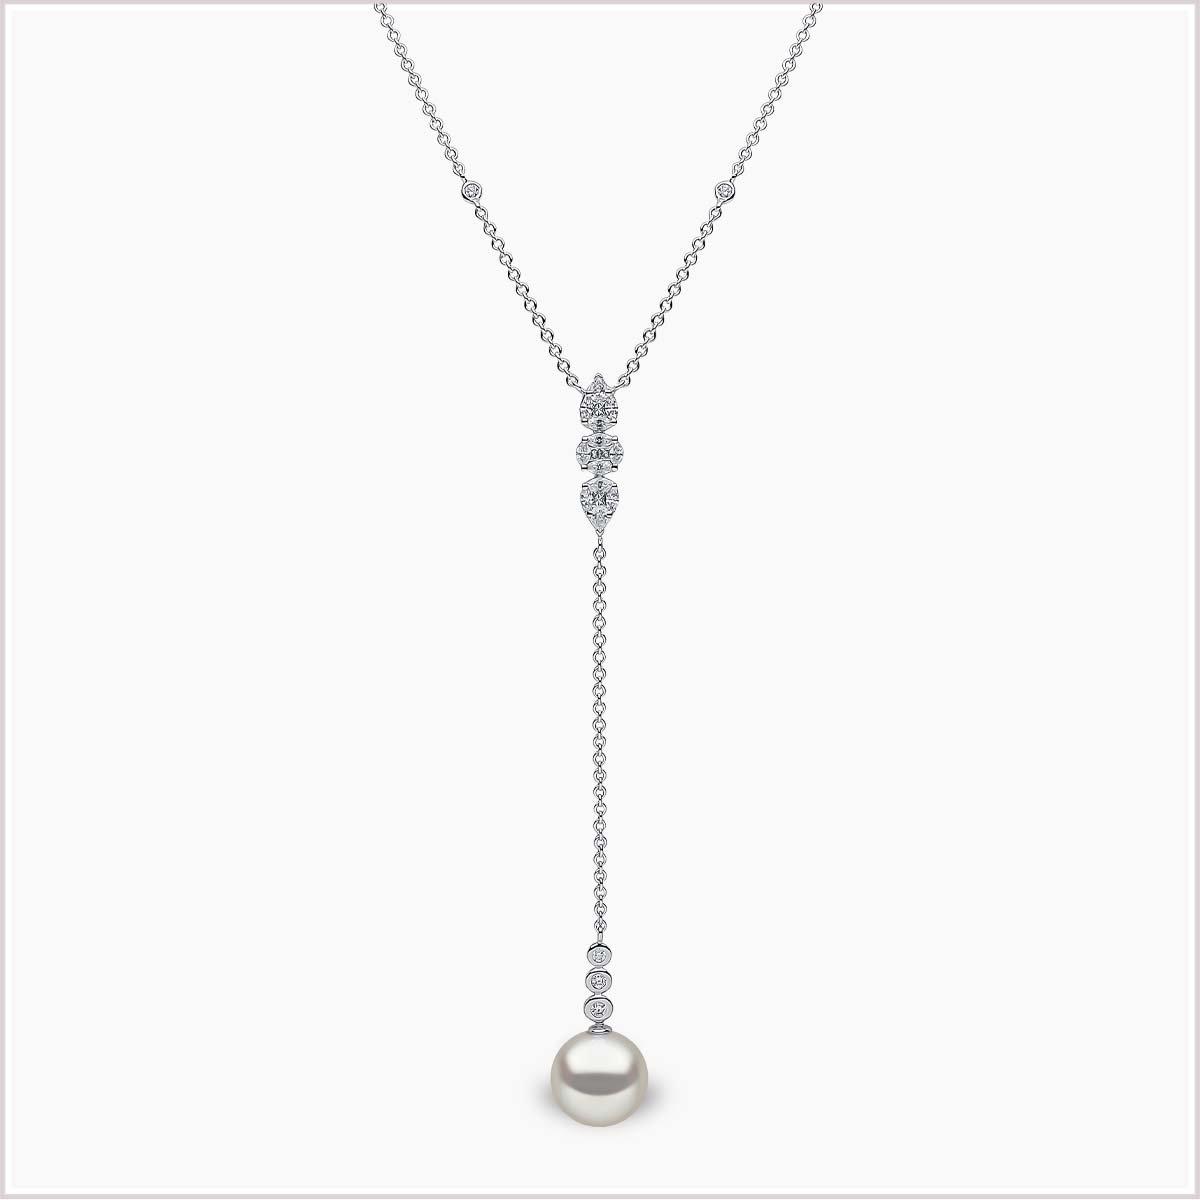 Yoko London Starlight Diamond and South Sea Pearl Necklace